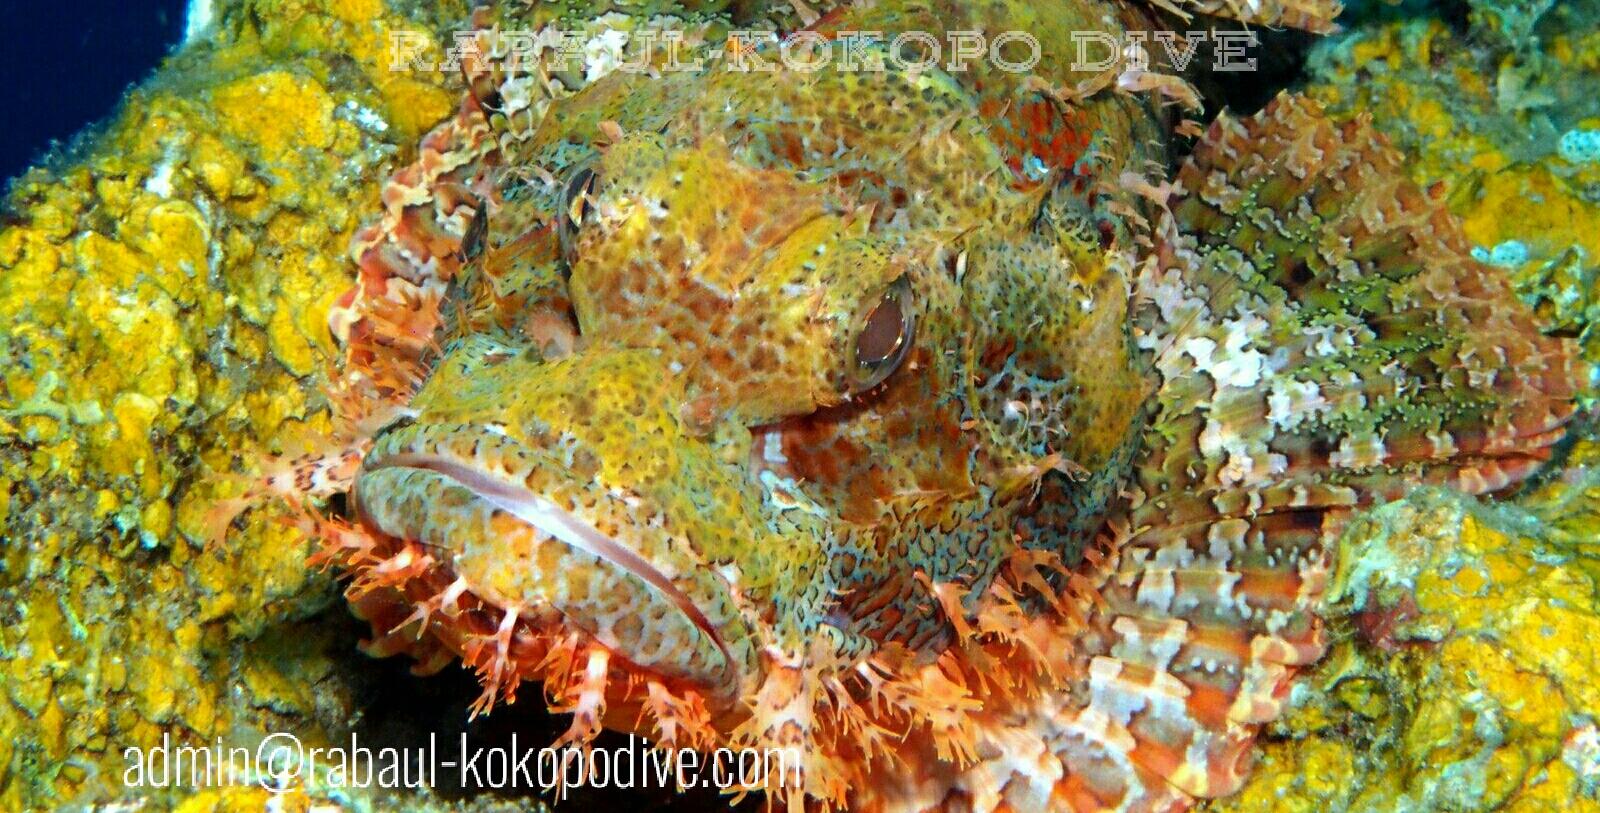 Rabaul Kokopo Dive